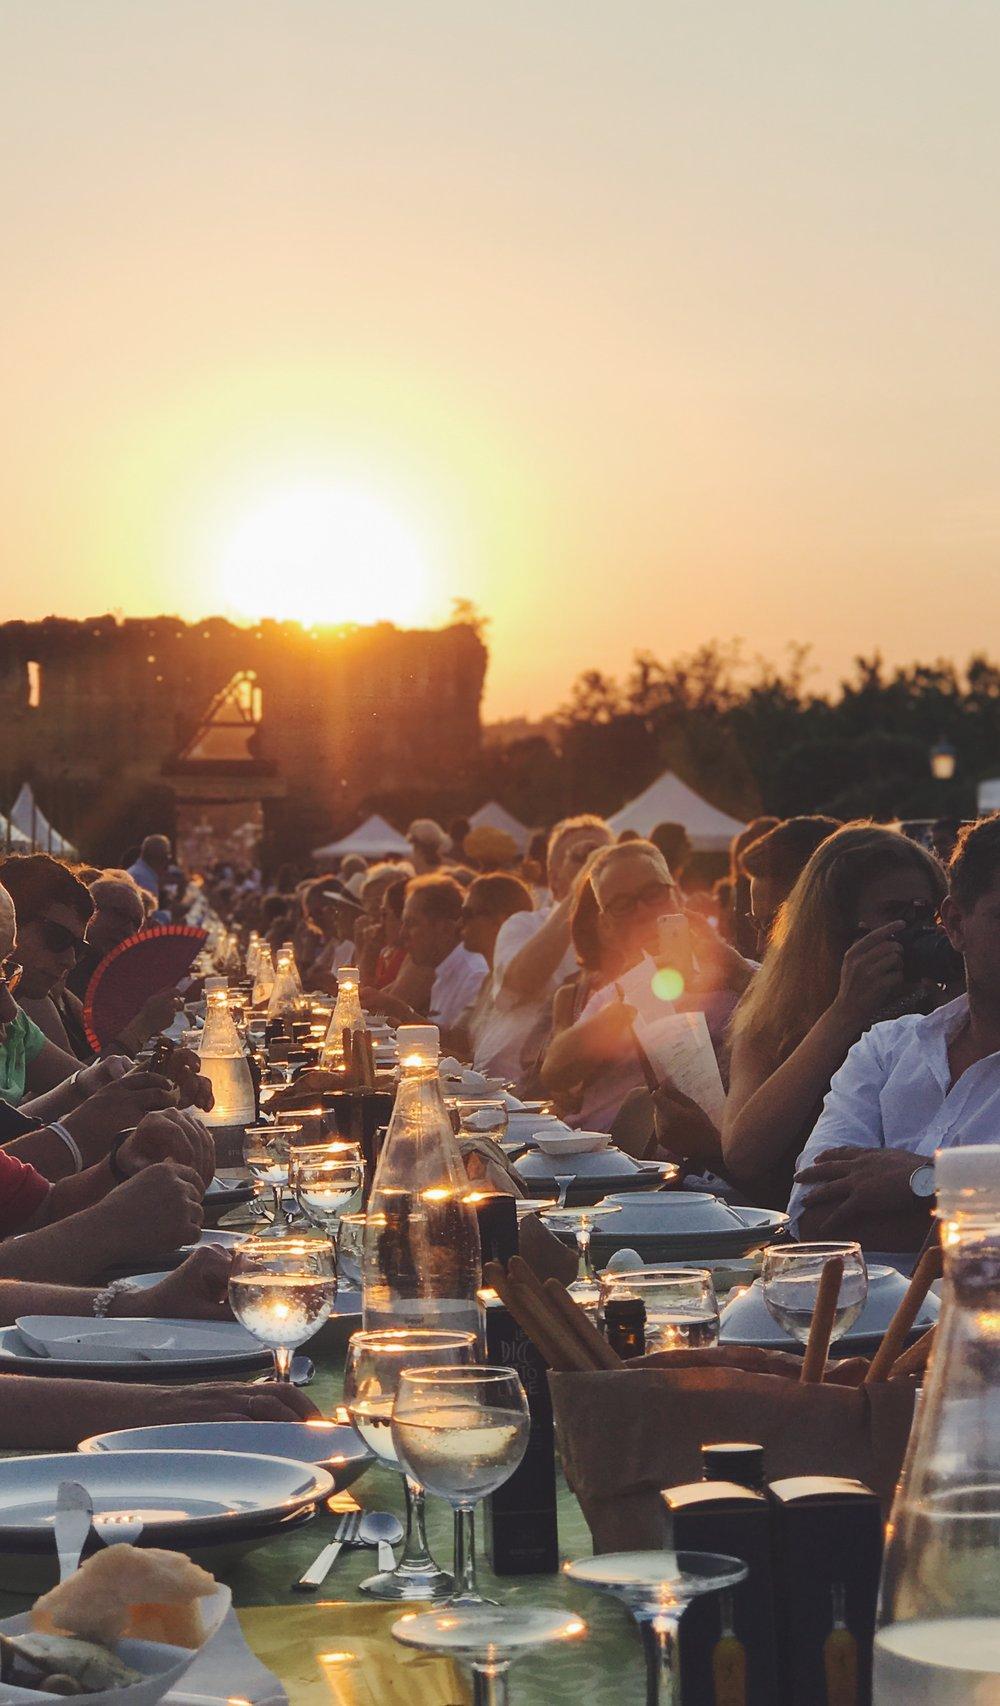 festa del nodo d'amore_italien_food festival